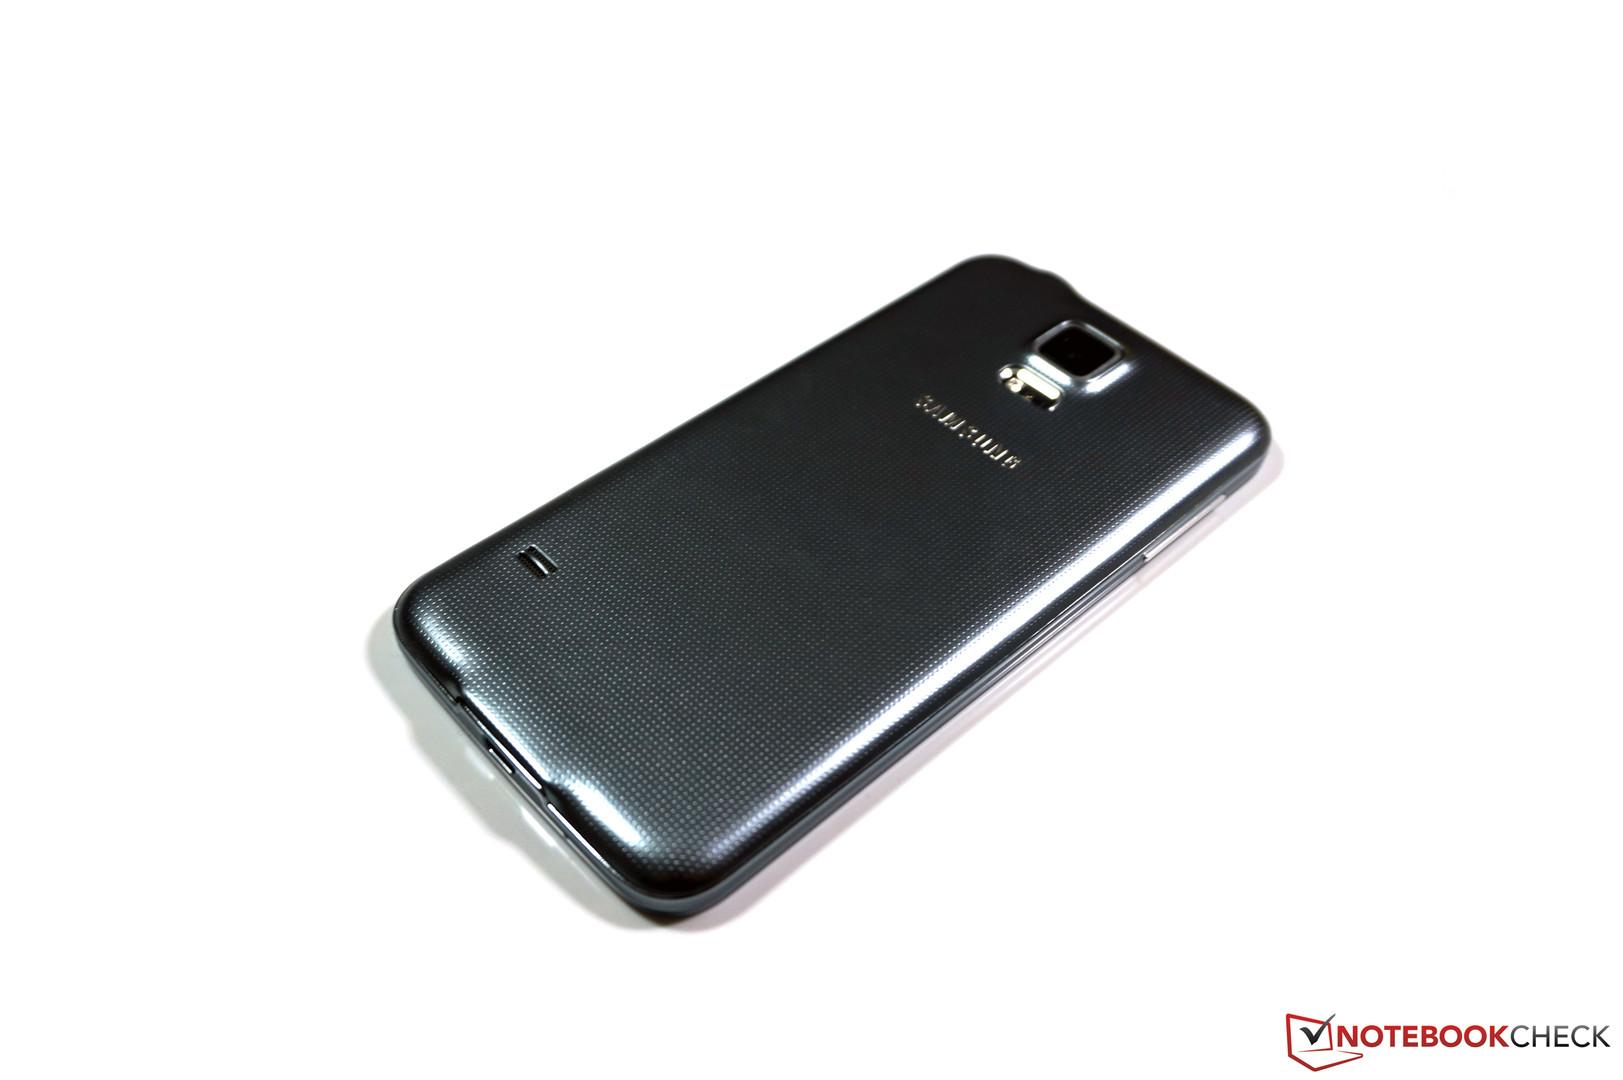 Test Samsung Galaxy S5 Neo Smartphone Notebookcheckcom Tests